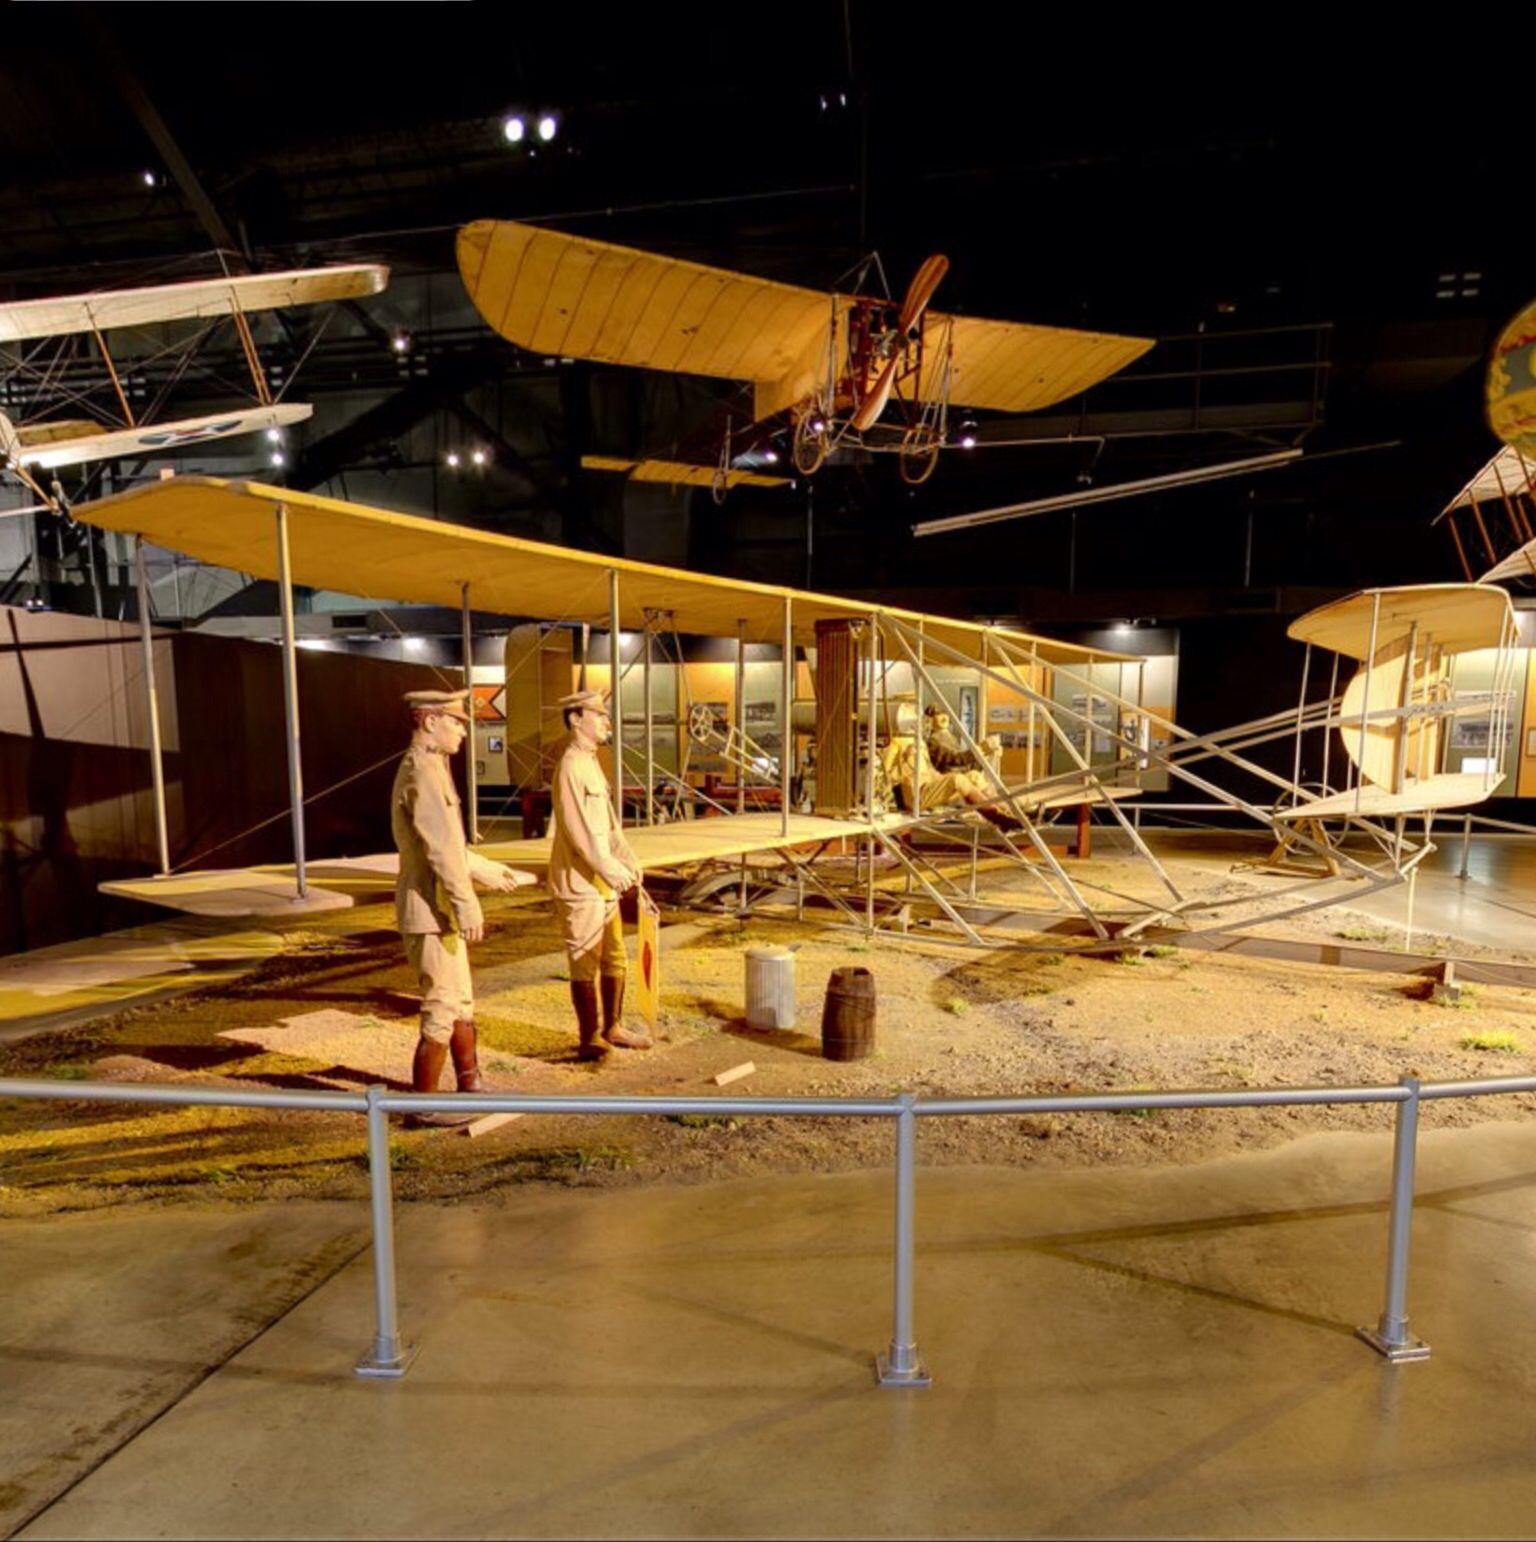 Early years, Wright Brothers. Dayton ohio, Wright